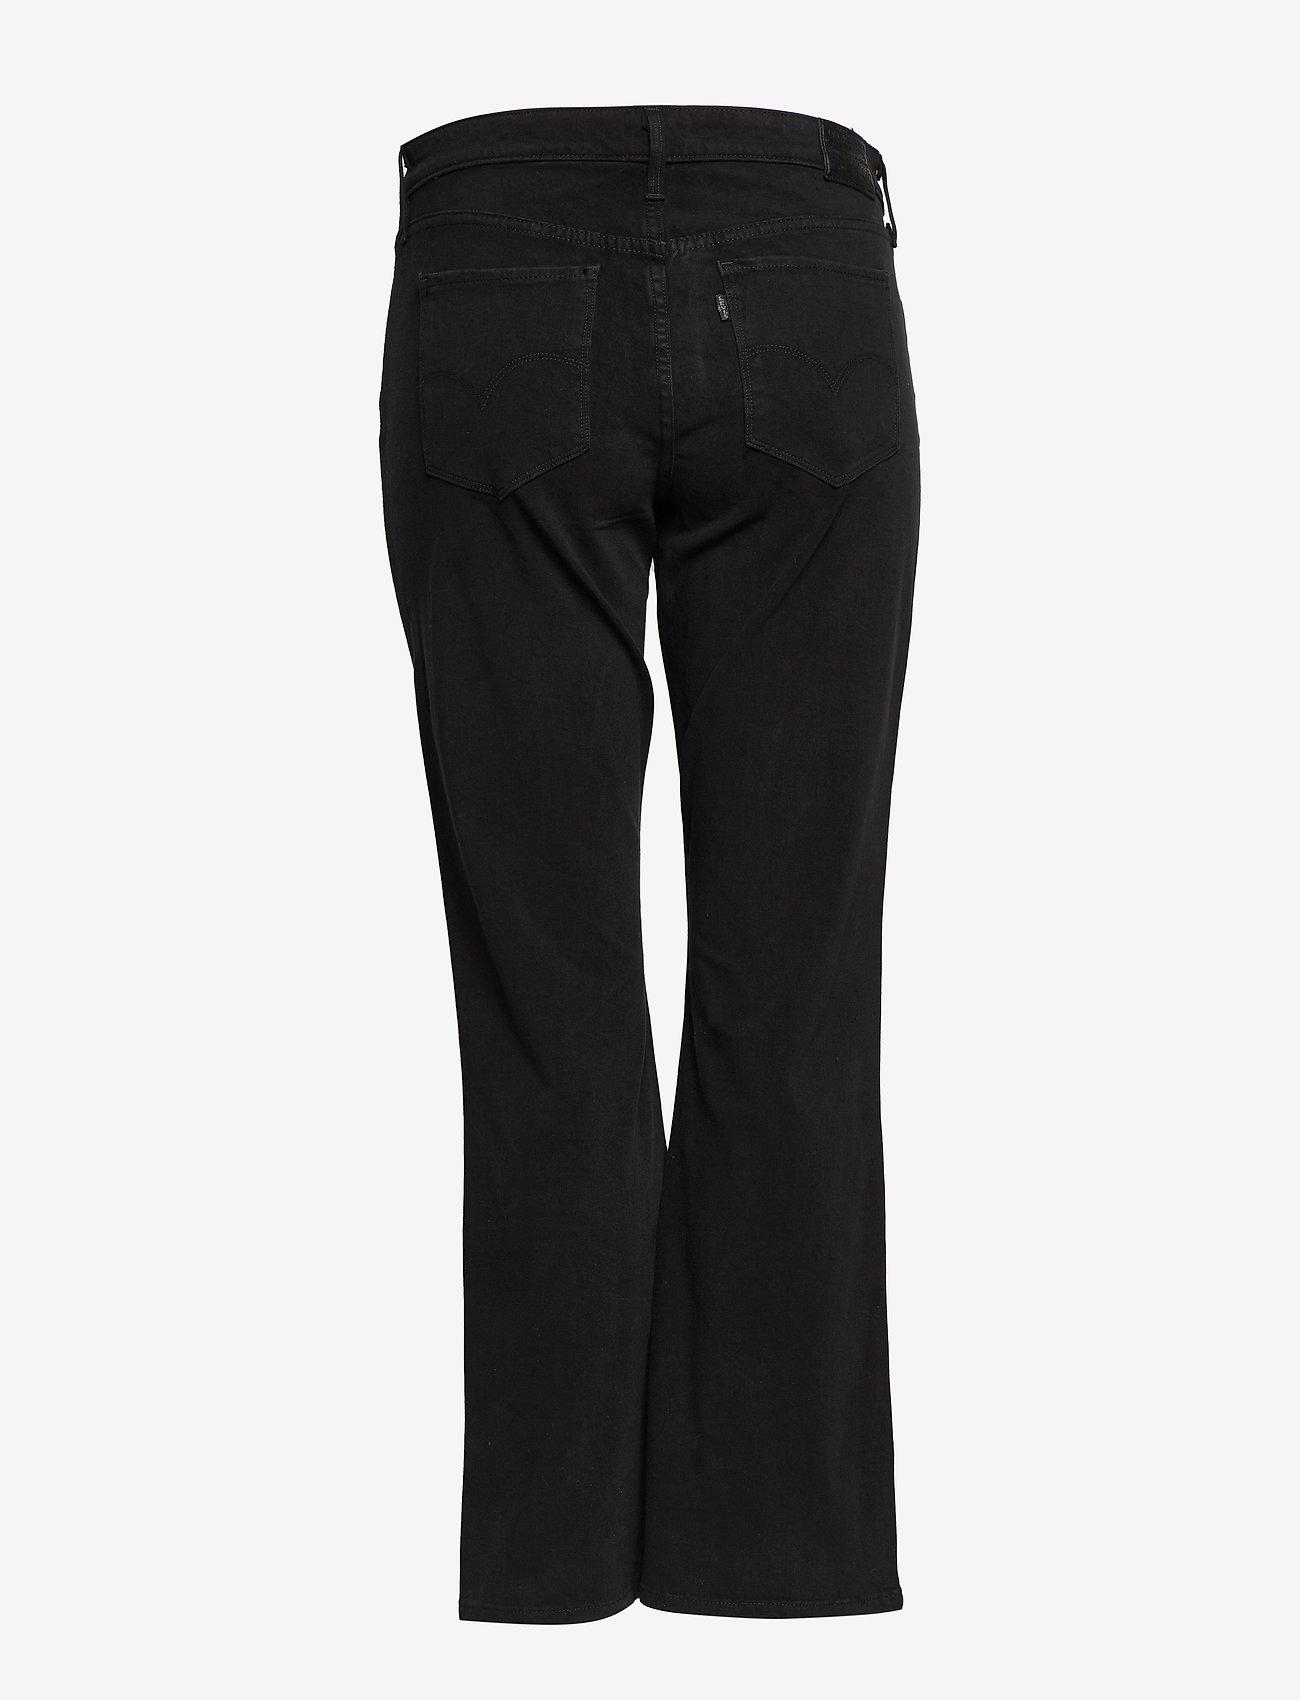 Levi's Plus Size - 315 PL SHAPING BOOT 4X STRETCH - straight leg trousers - blacks - 1